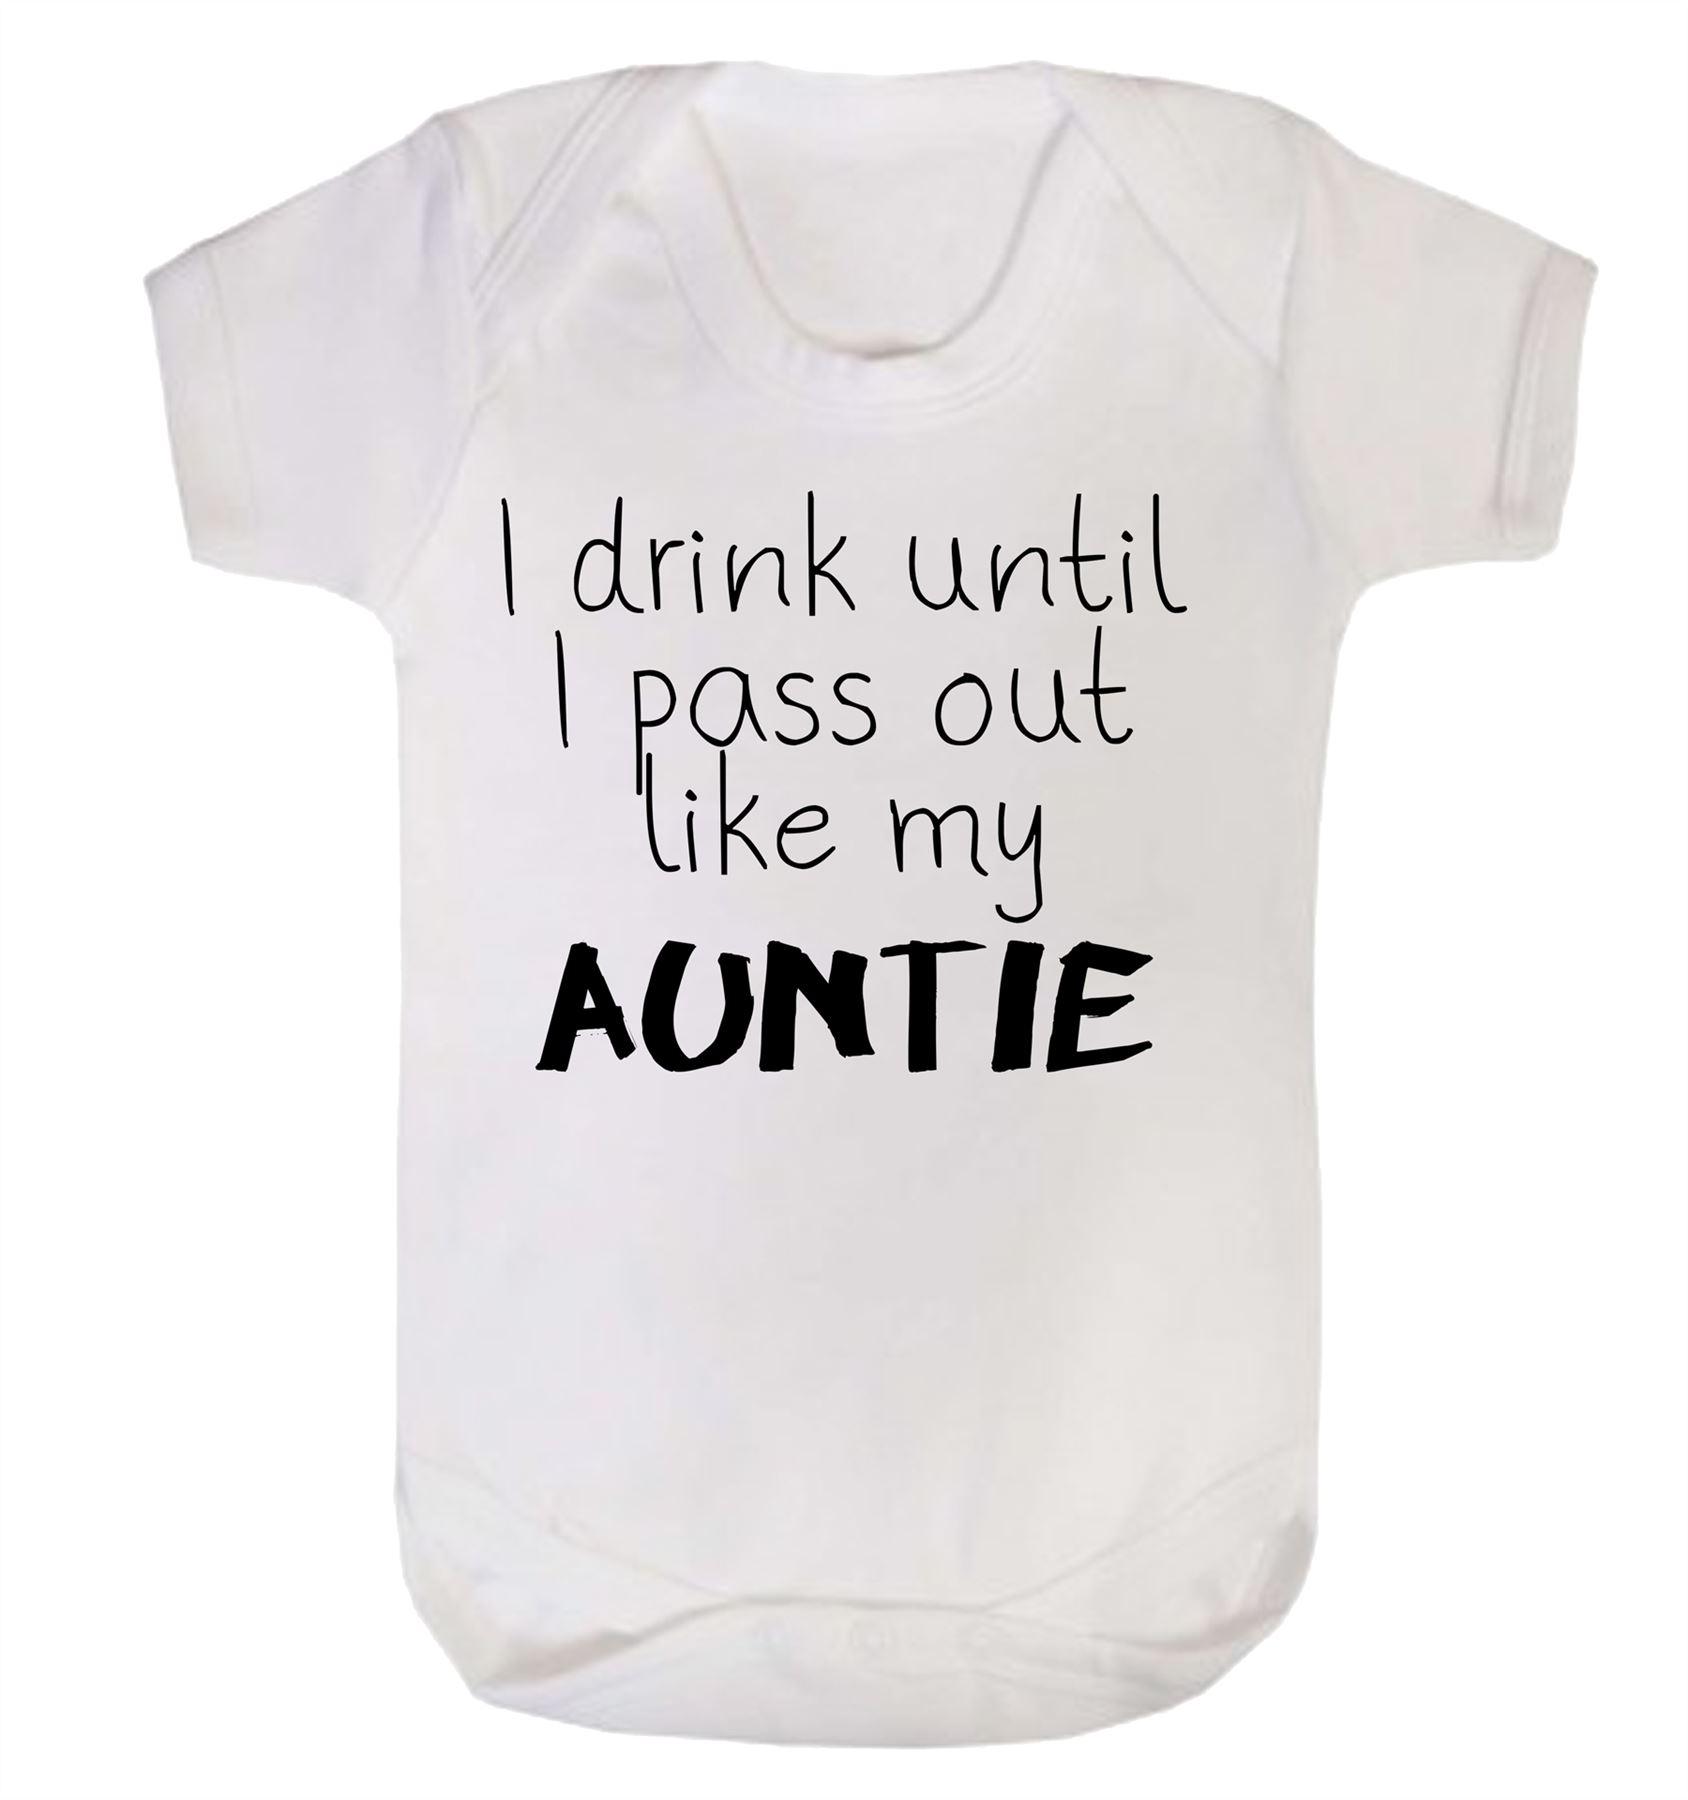 I drink until I pass out Funny Baby Vest gift joke cute grow bodysuit boy girl